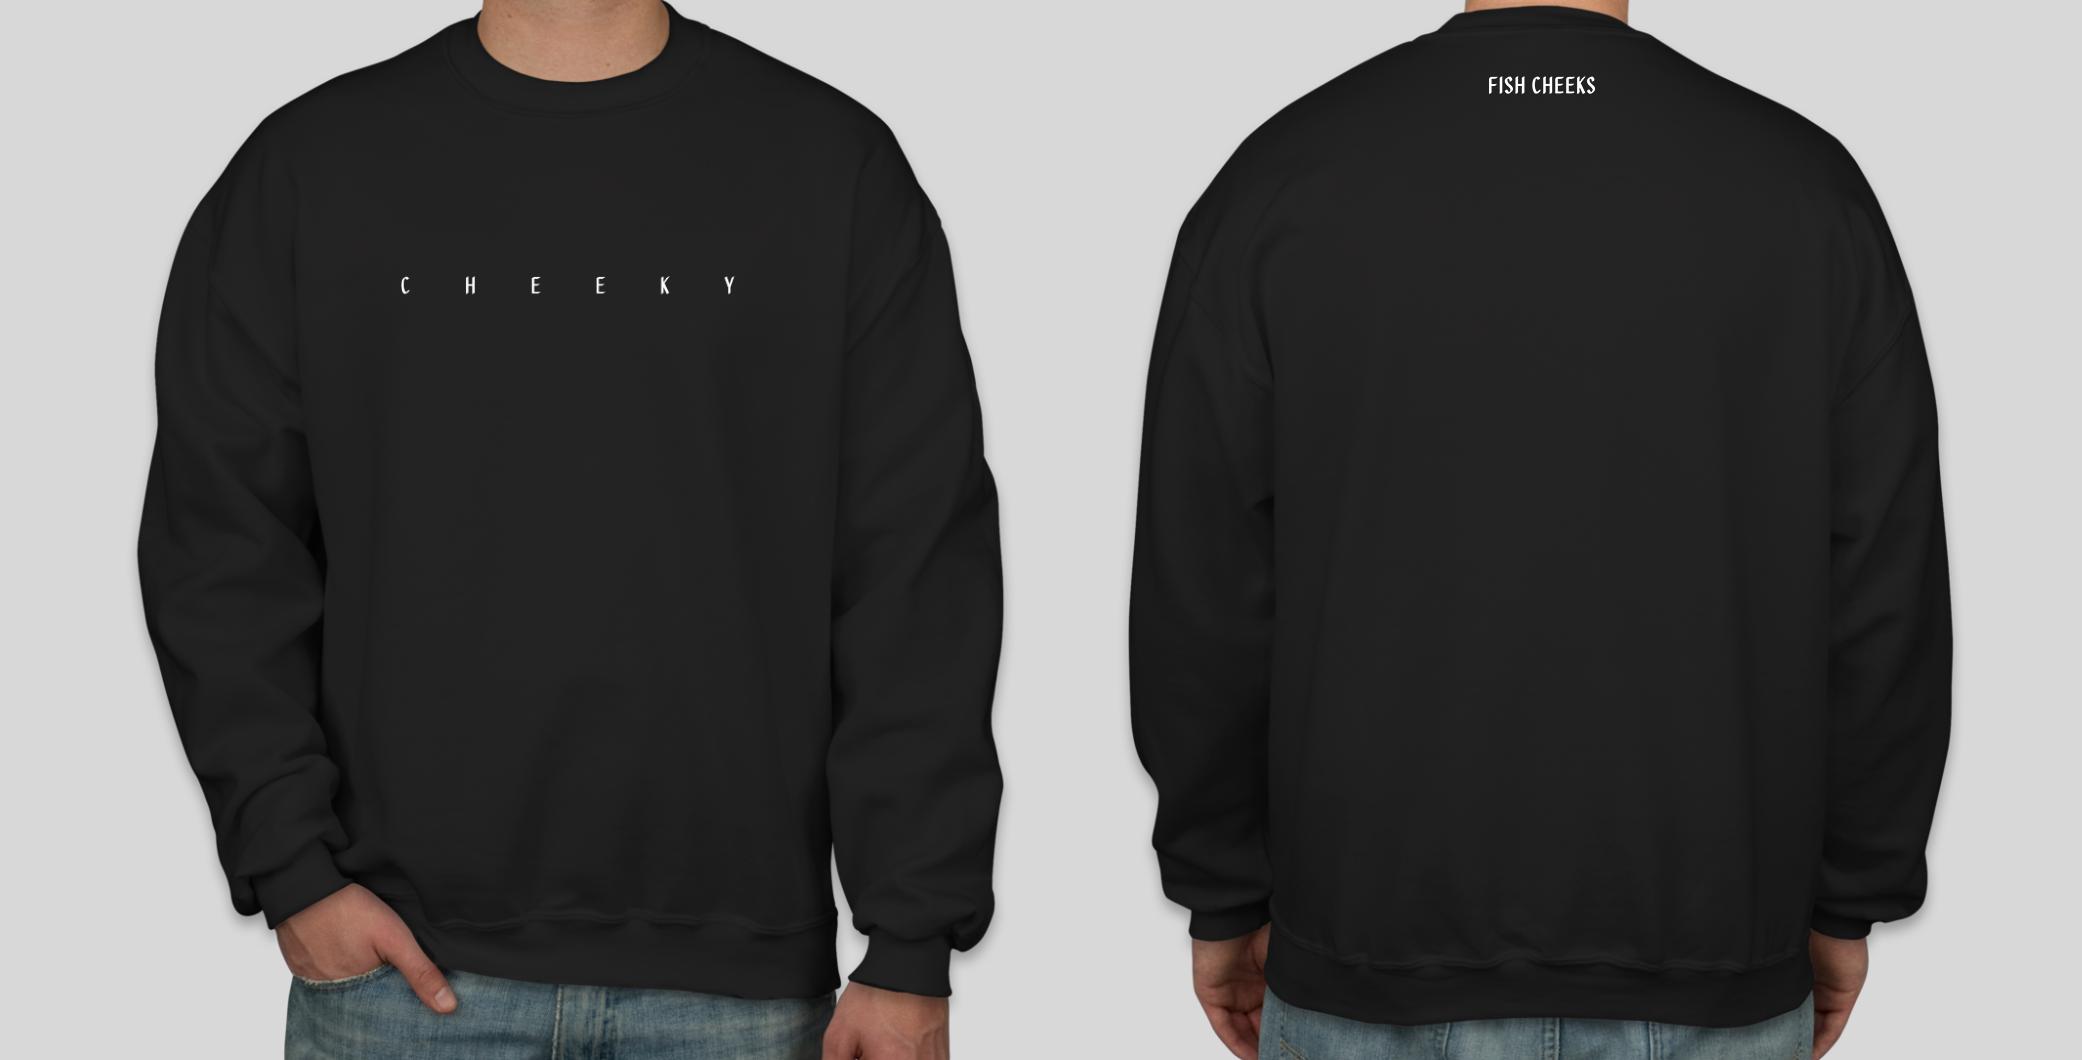 fc_cheeky_sweaters